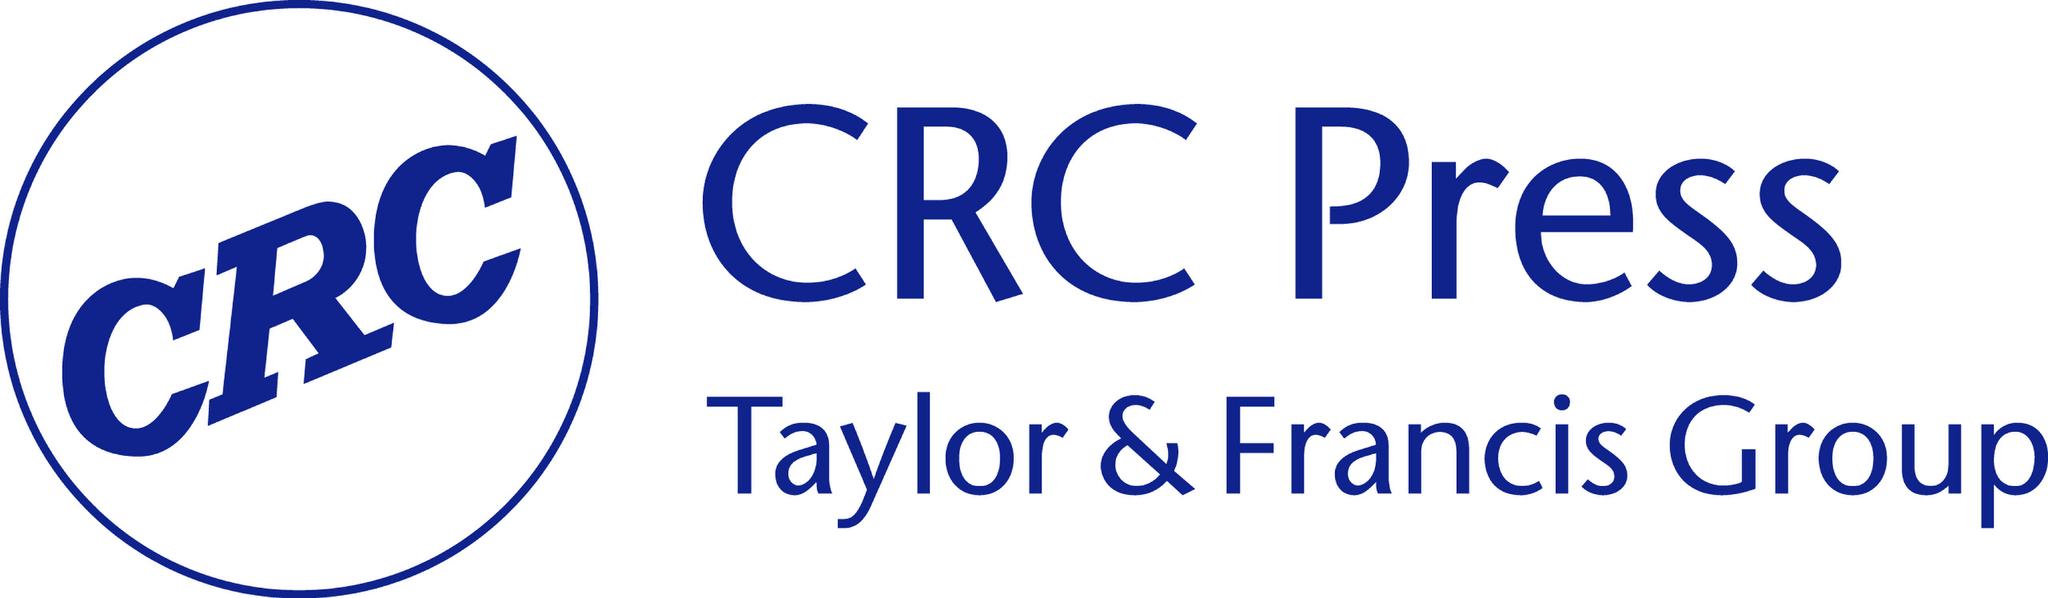 CRC Press